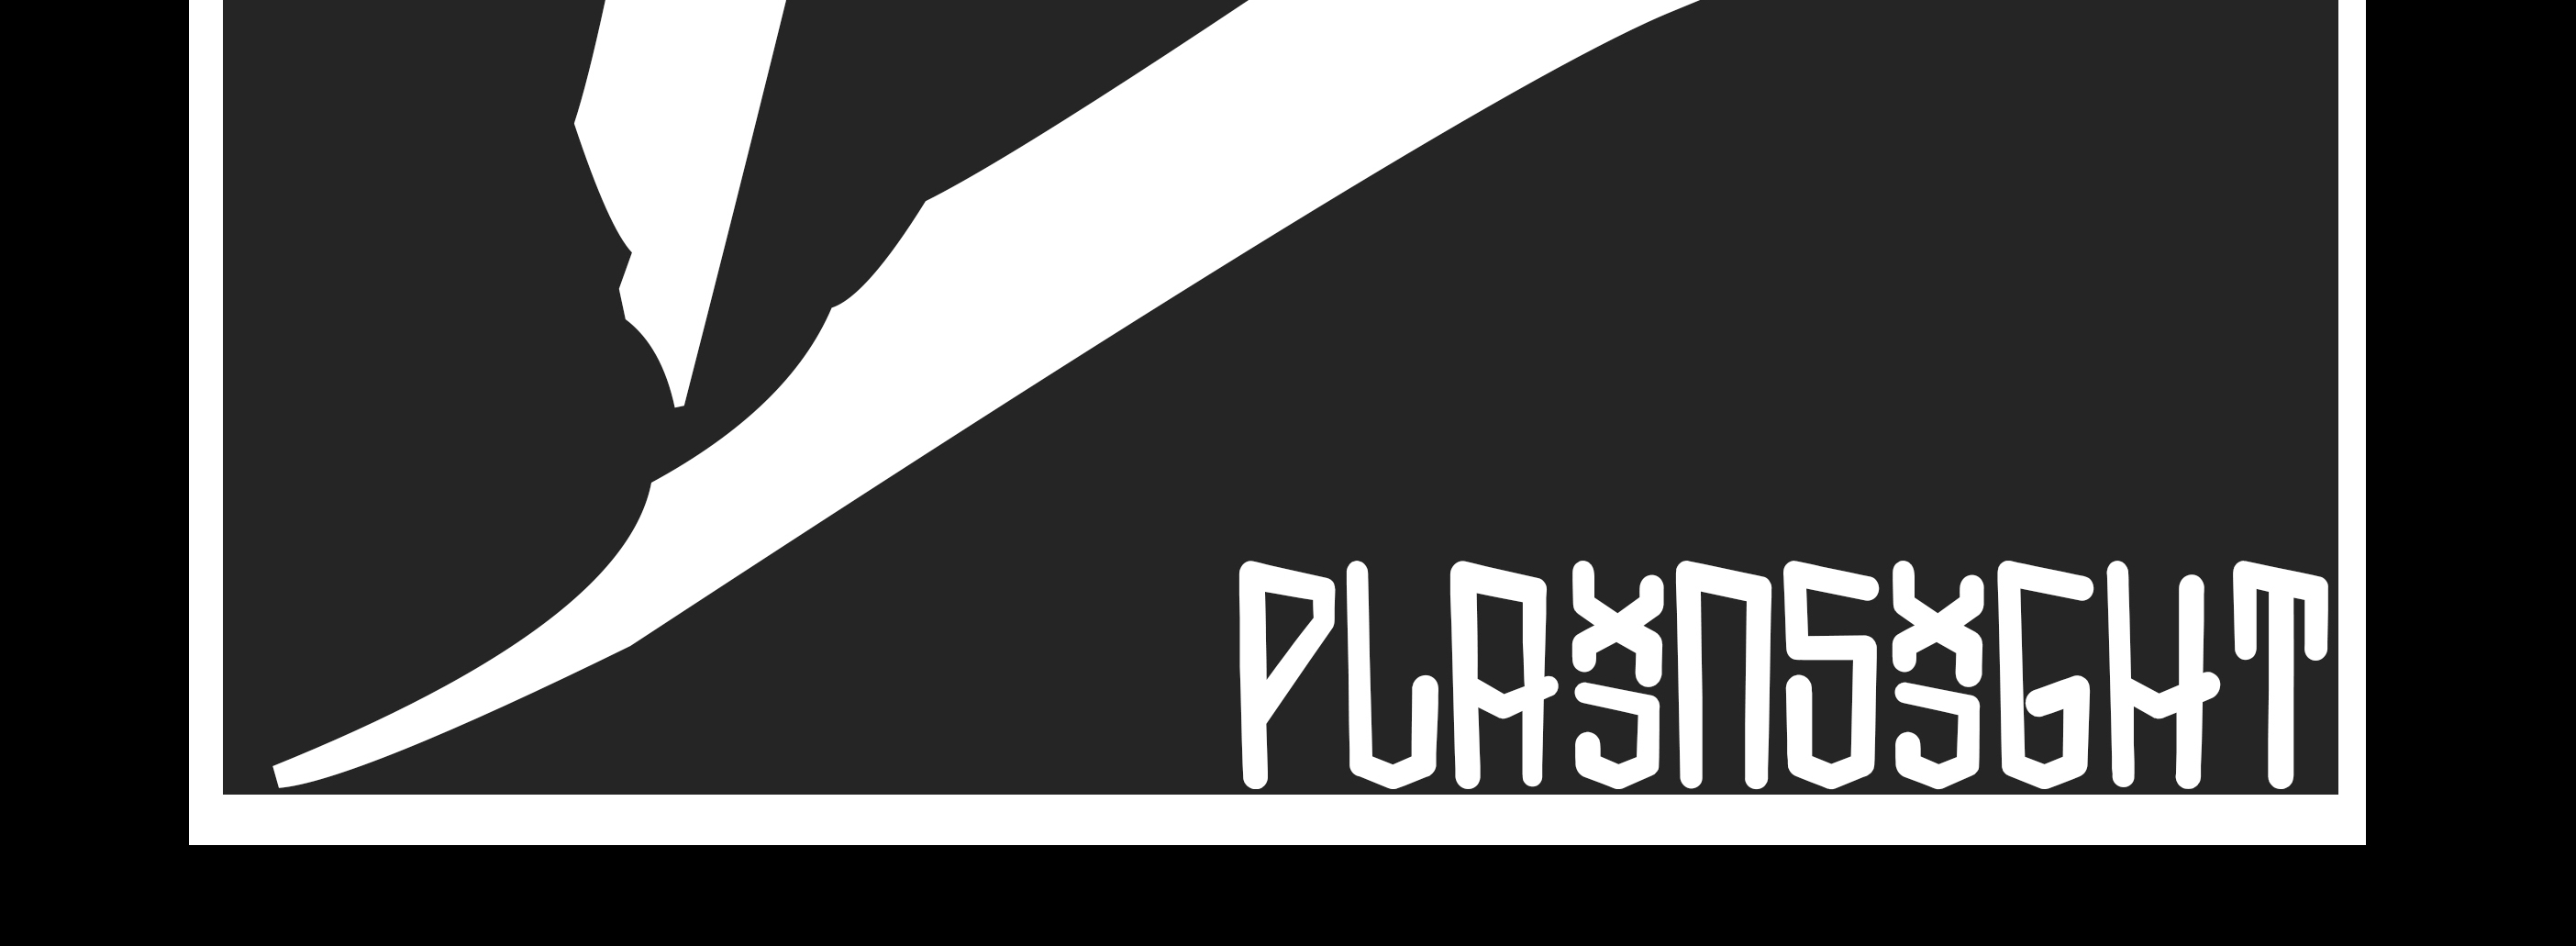 Plainsightlogo2_copy__1_